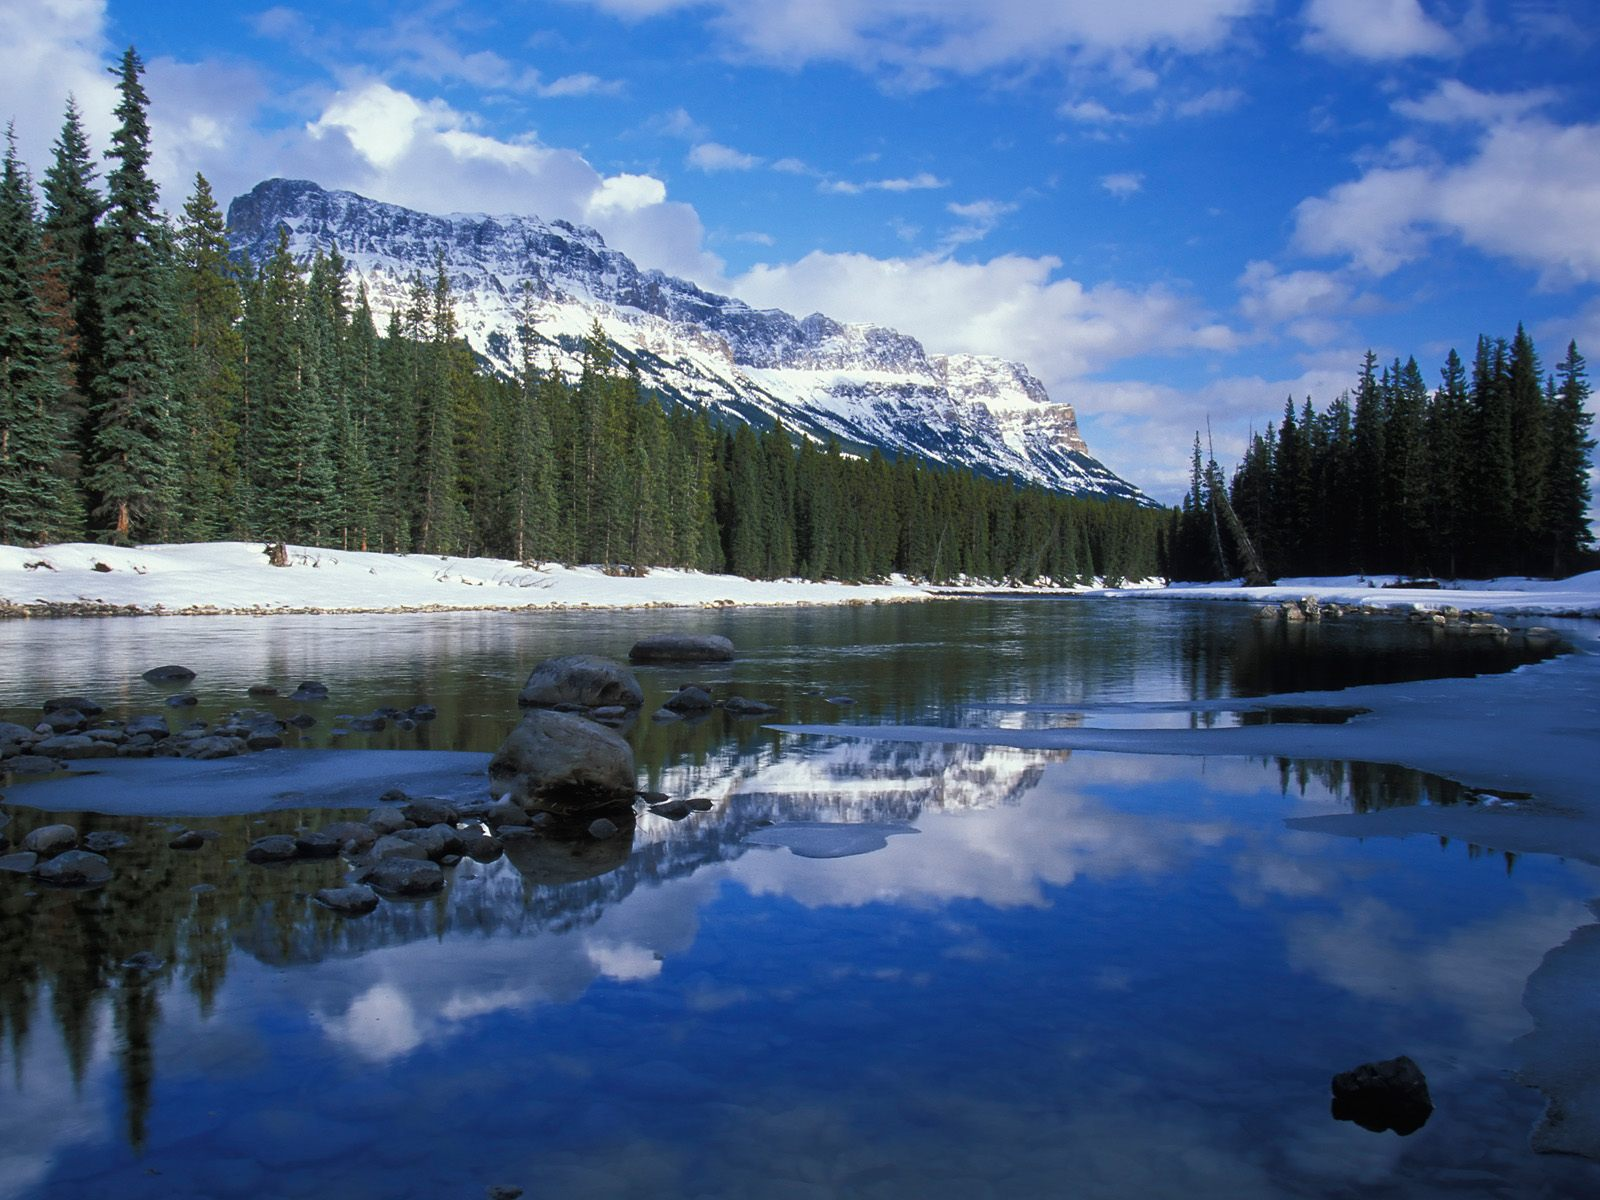 Bow River and Castle Mountain, Alberta, Canada